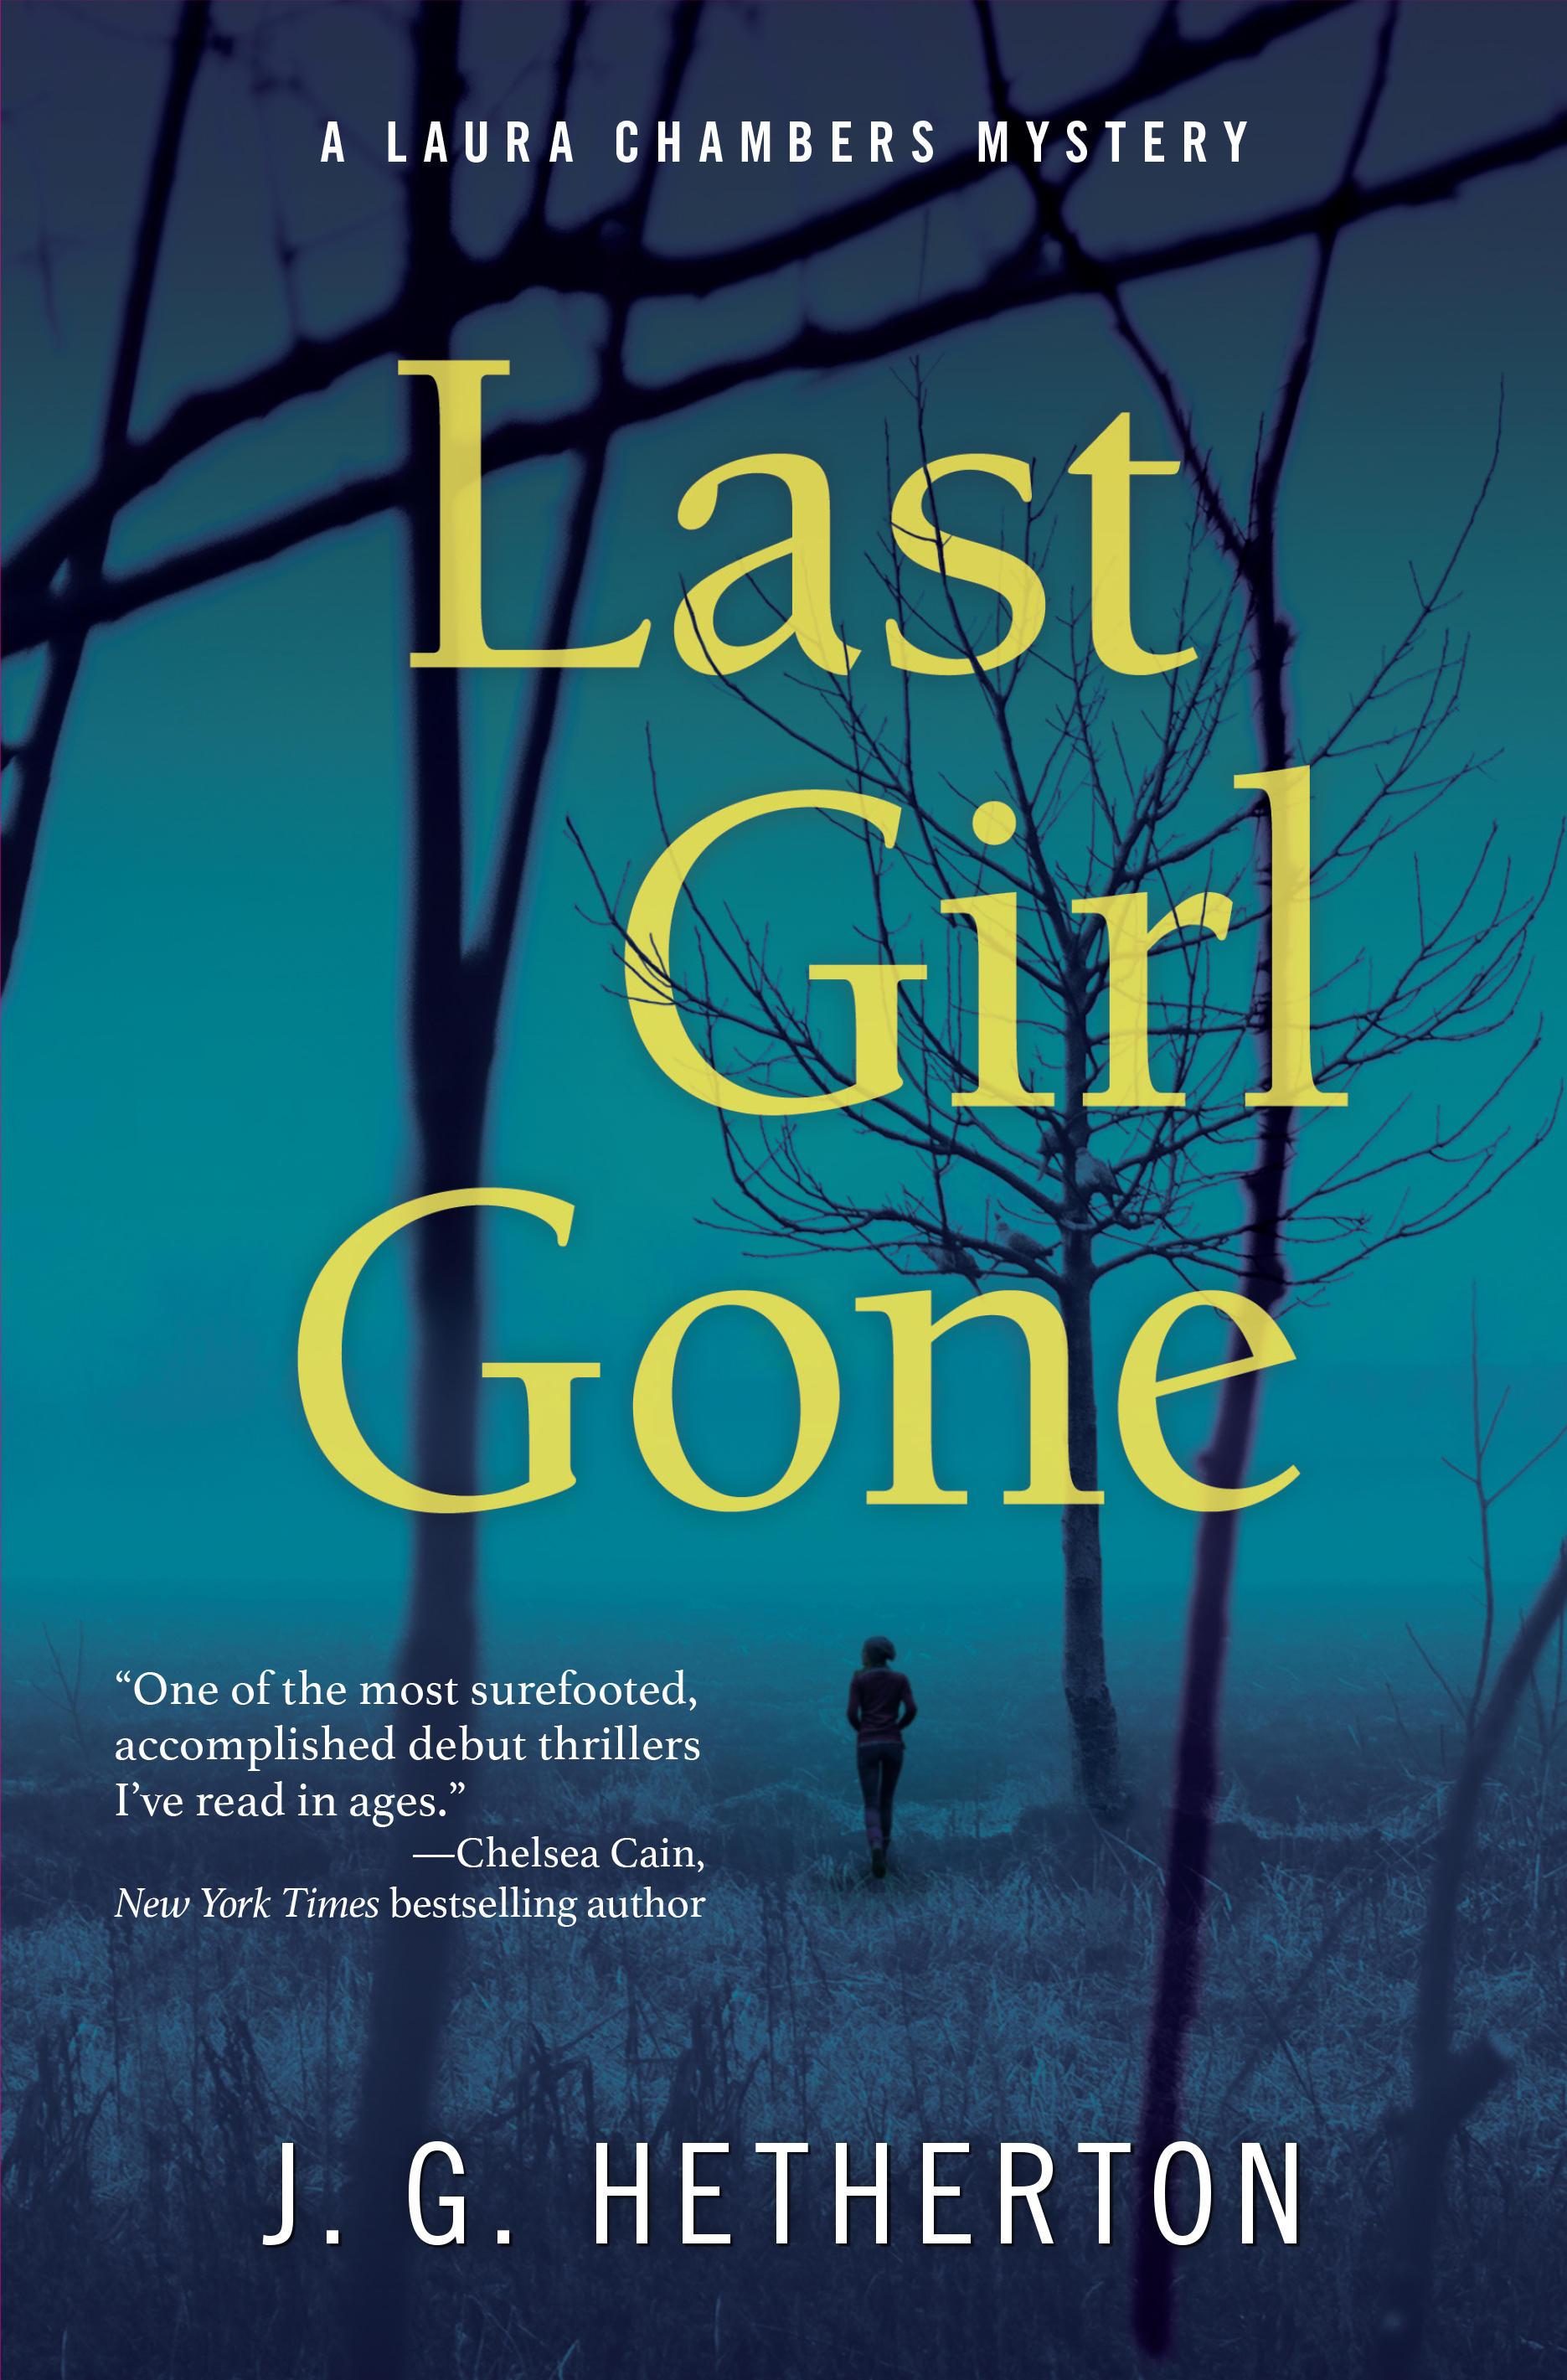 A New NC Mystery Novel Stars An Impulsive Journalist In A Dark But ...